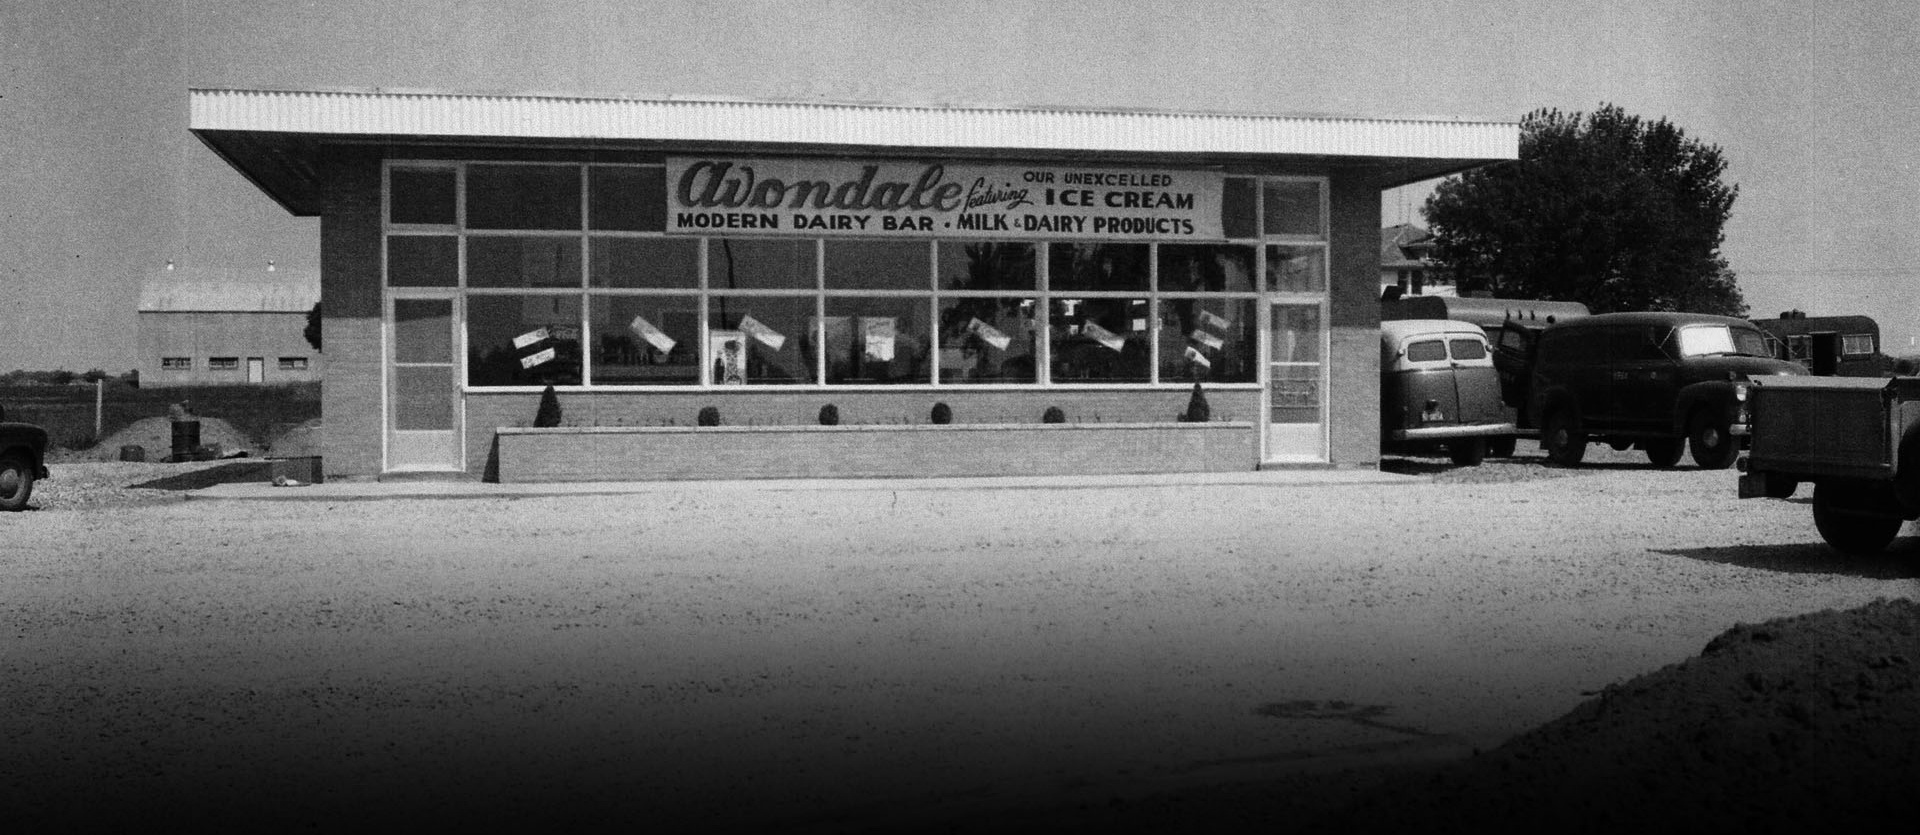 Dairy Bar 2 - 1955